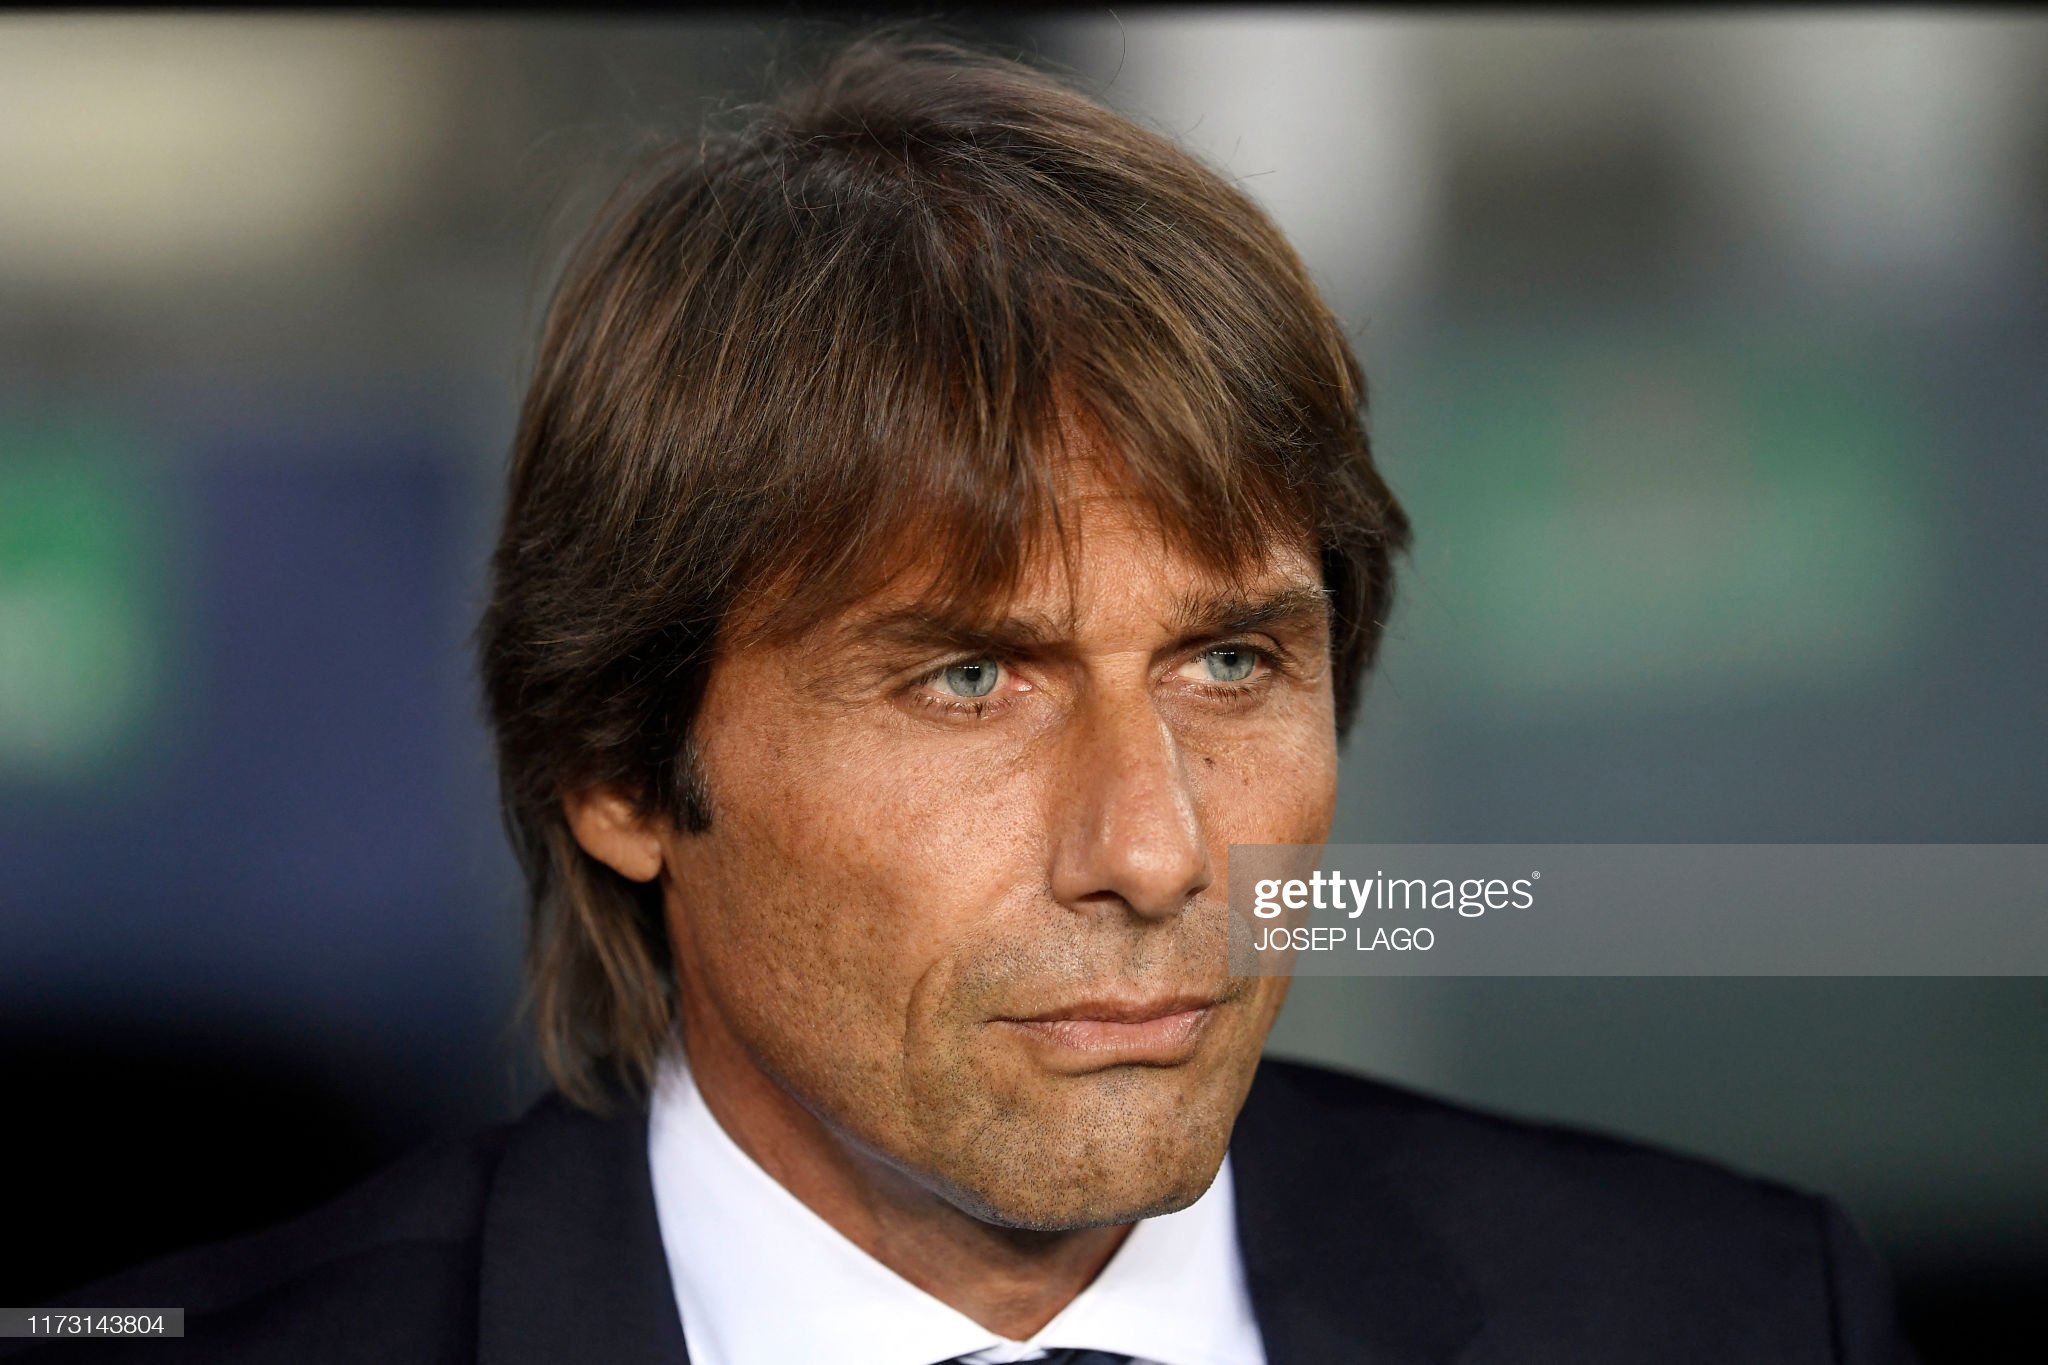 صور مباراة : برشلونة - إنتر 2-1 ( 02-10-2019 )  Inter-milans-italian-coach-antonio-conte-looks-on-before-the-uefa-picture-id1173143804?s=2048x2048